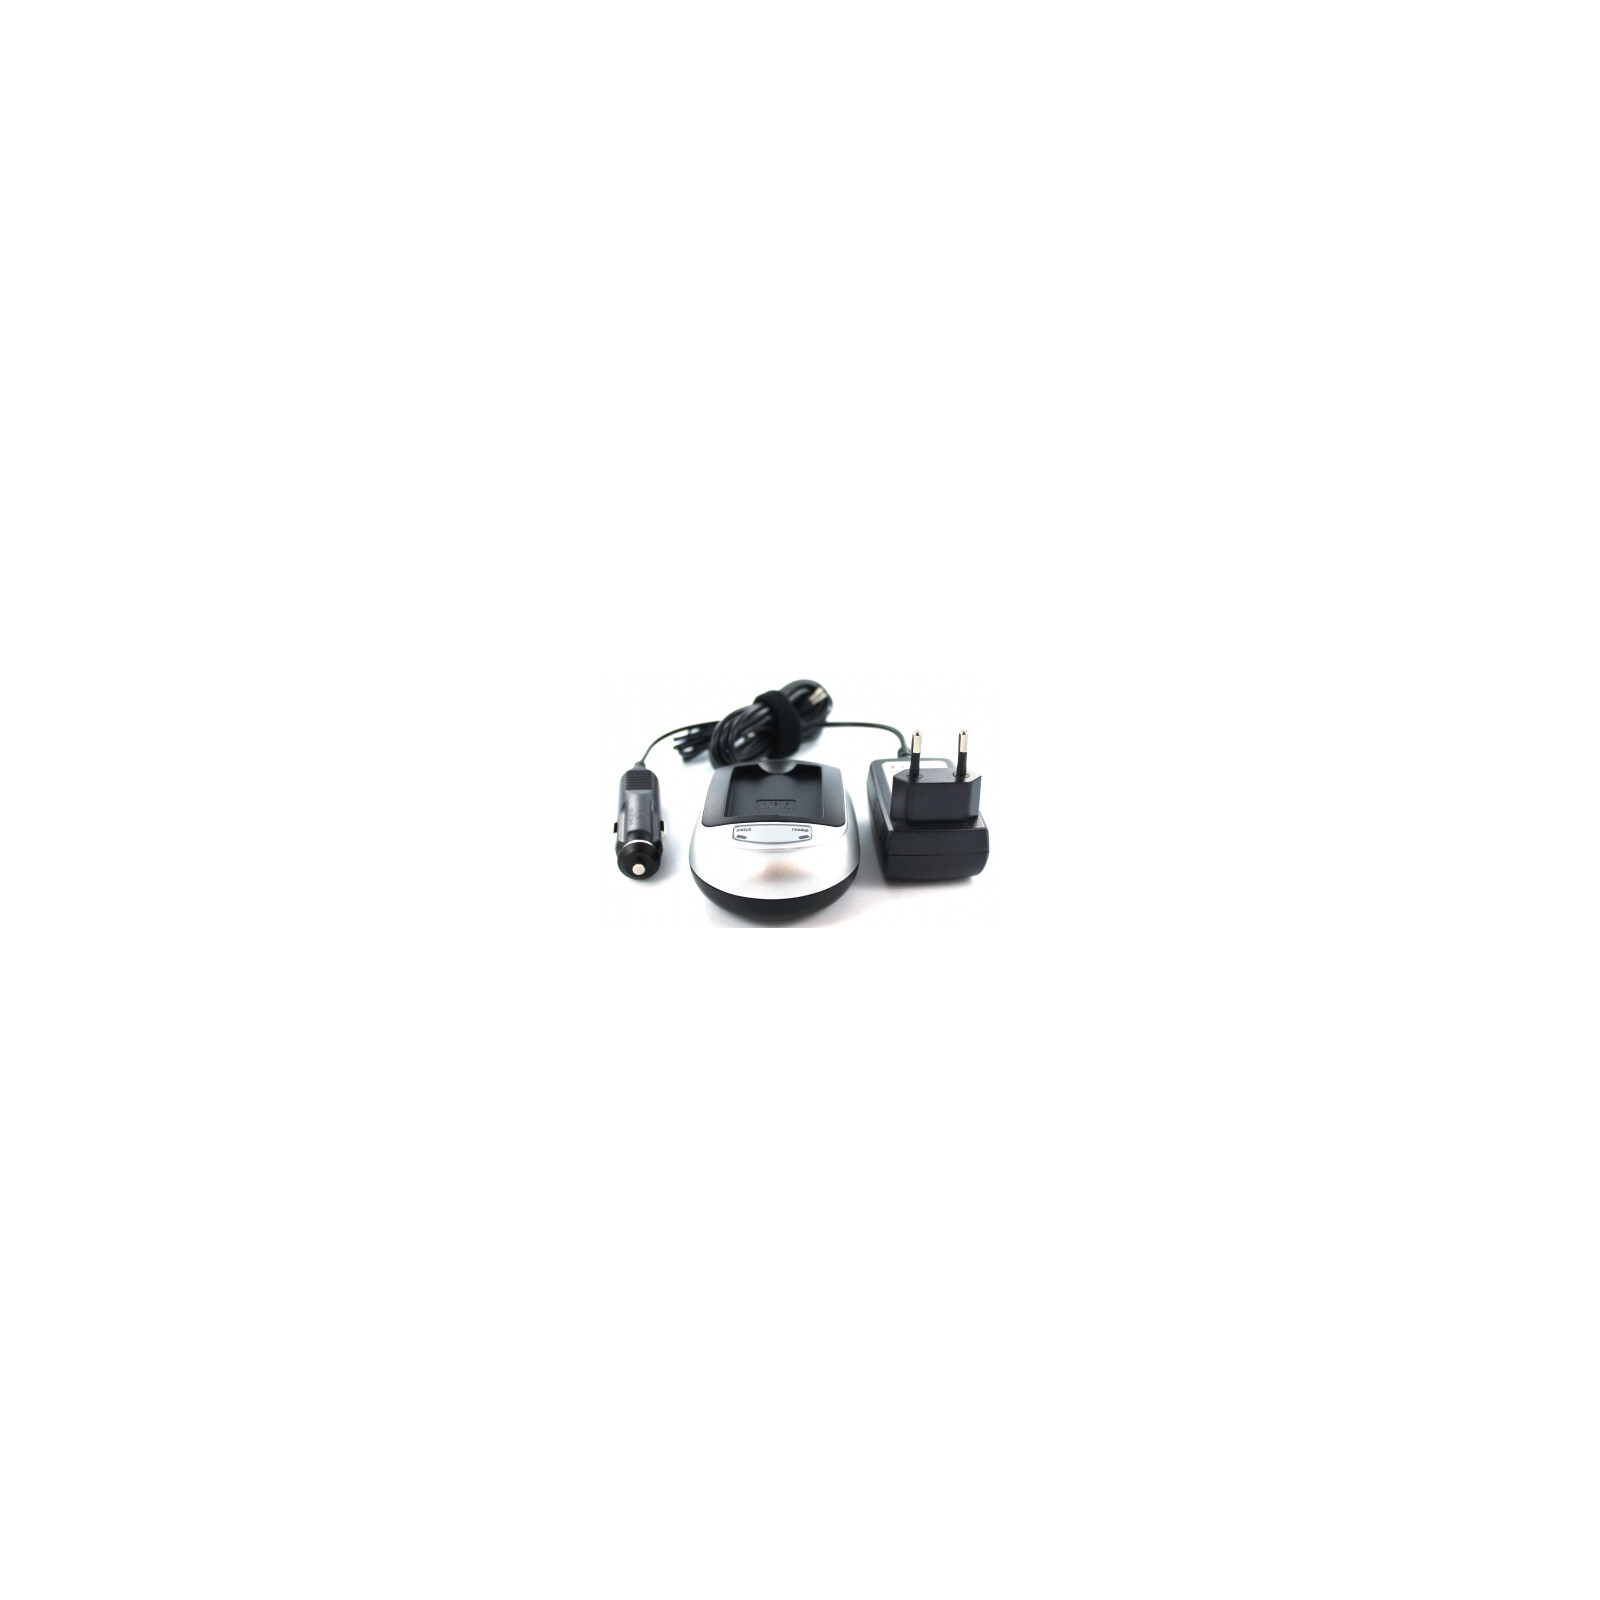 AGI 13415 Ladegerät Nikon D5300